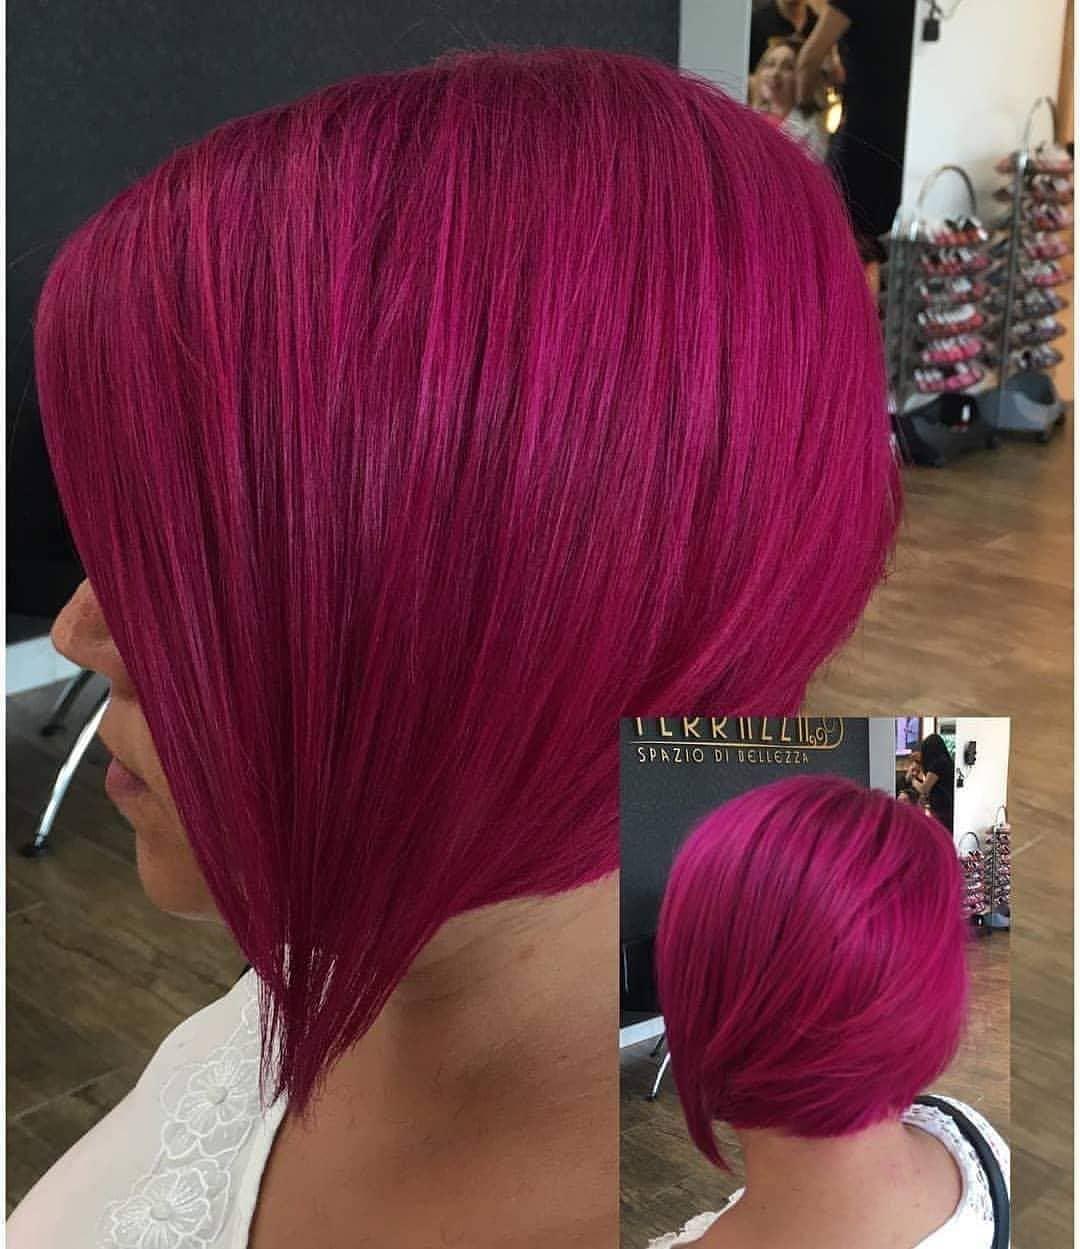 Kurze rote Frisuren Tipps